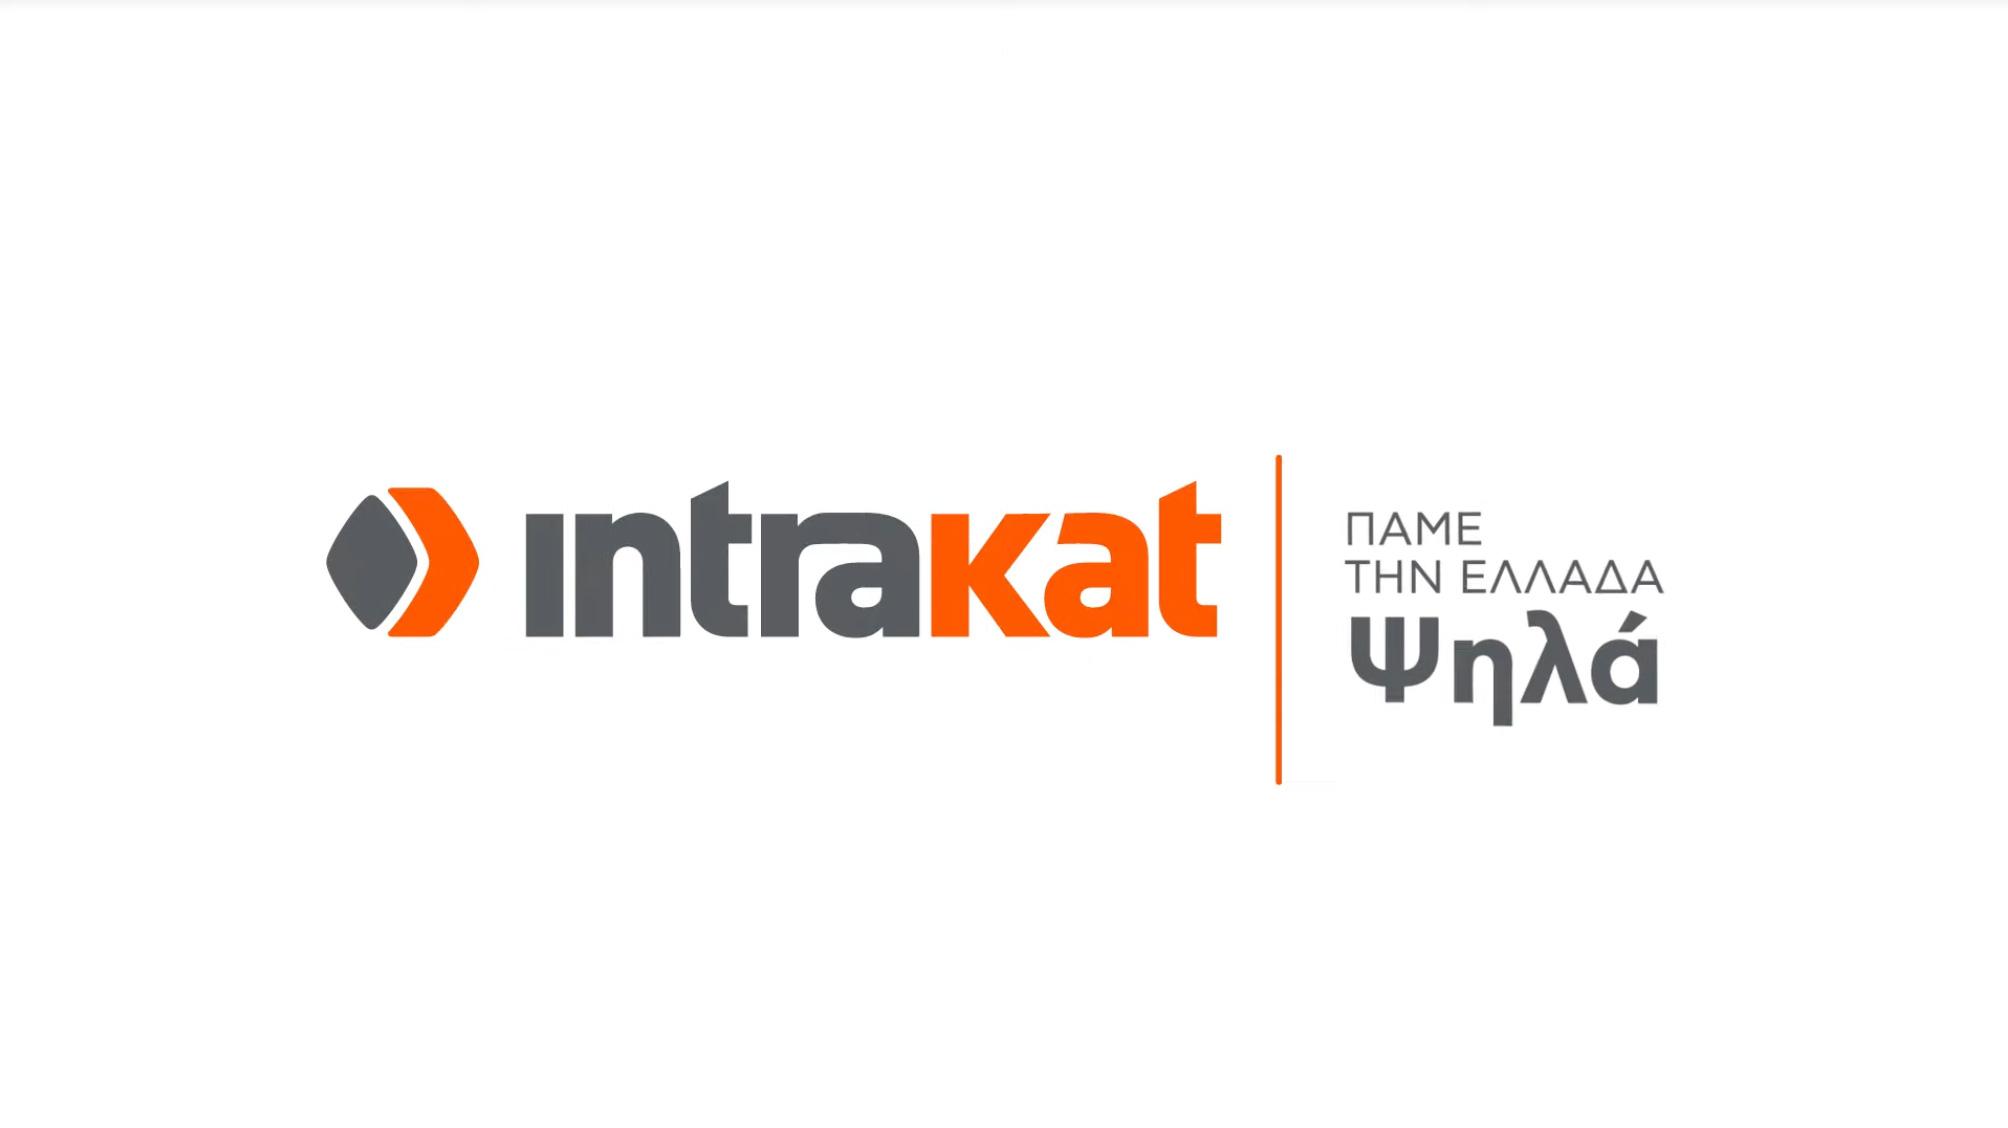 Intrakat: Αναβάθμισε 14 αεροδρόμια της Fraport και … «Πάει την Ελλάδα ψηλά!»  (video)